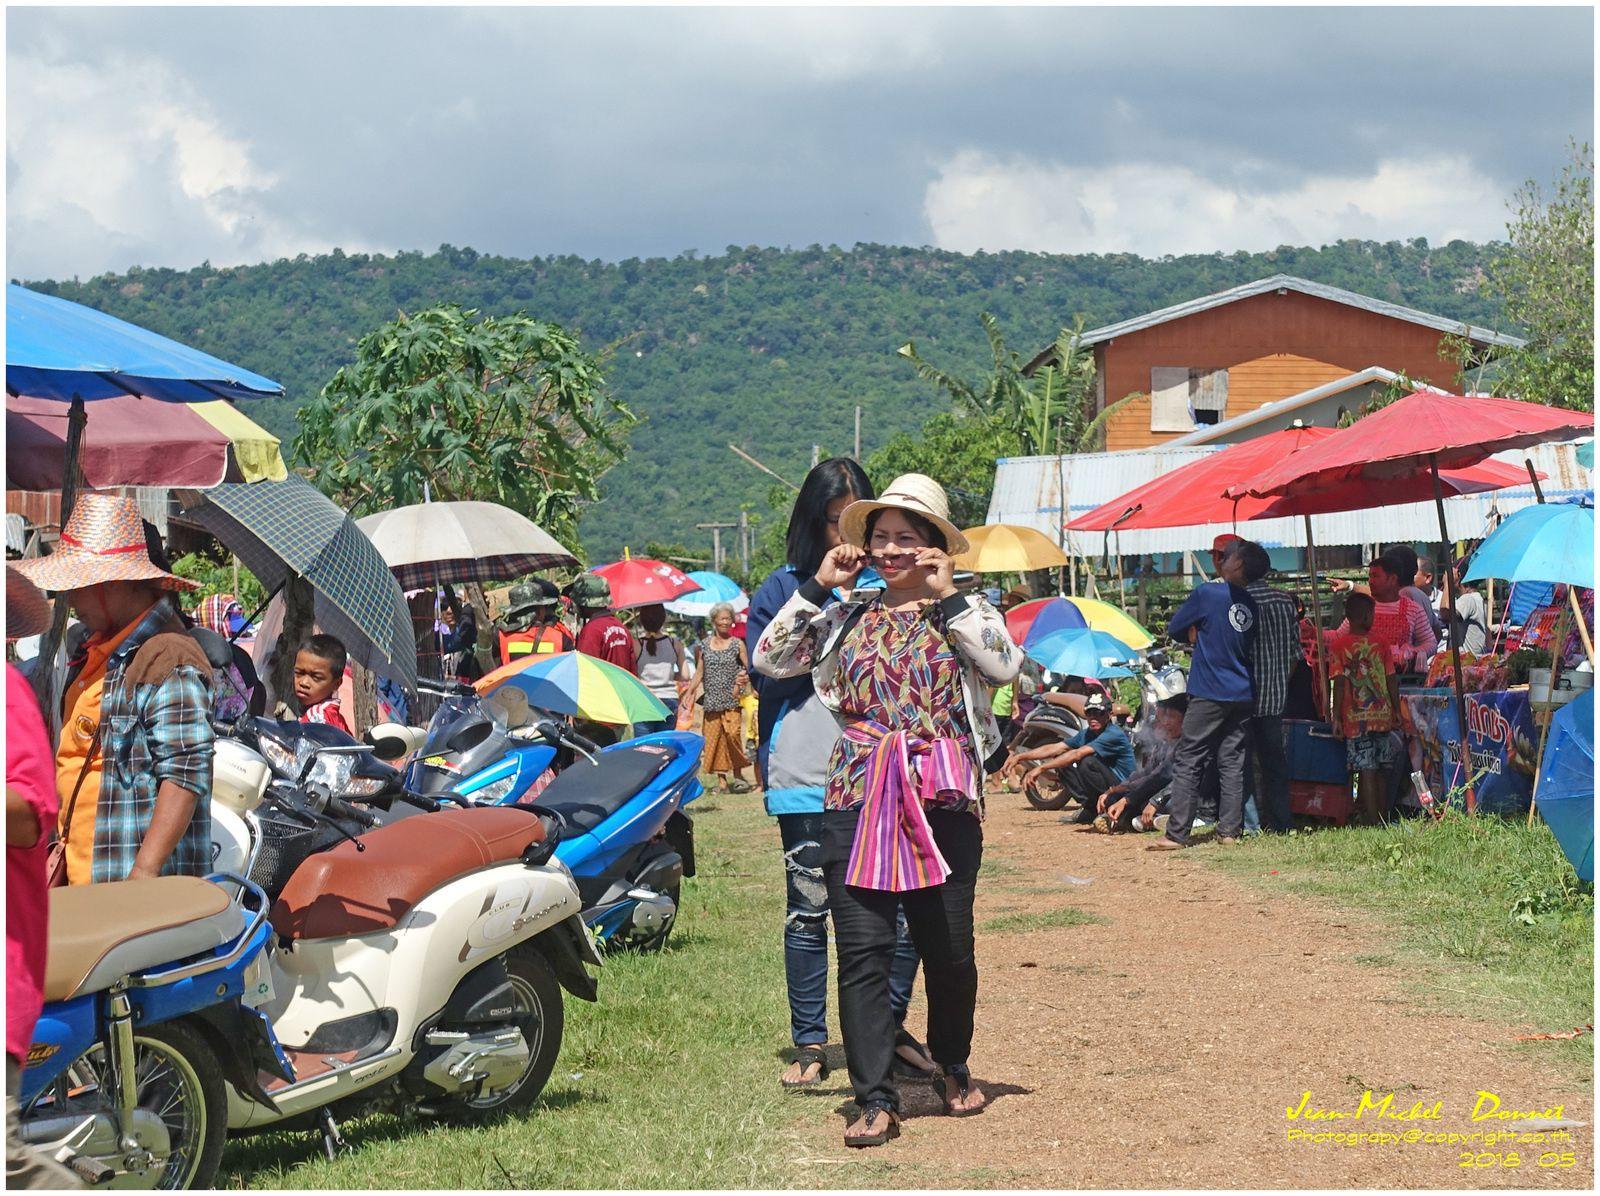 Festival des fusées (Thaïlande, Isaan)  ประเพณีบุญบั้งไฟ